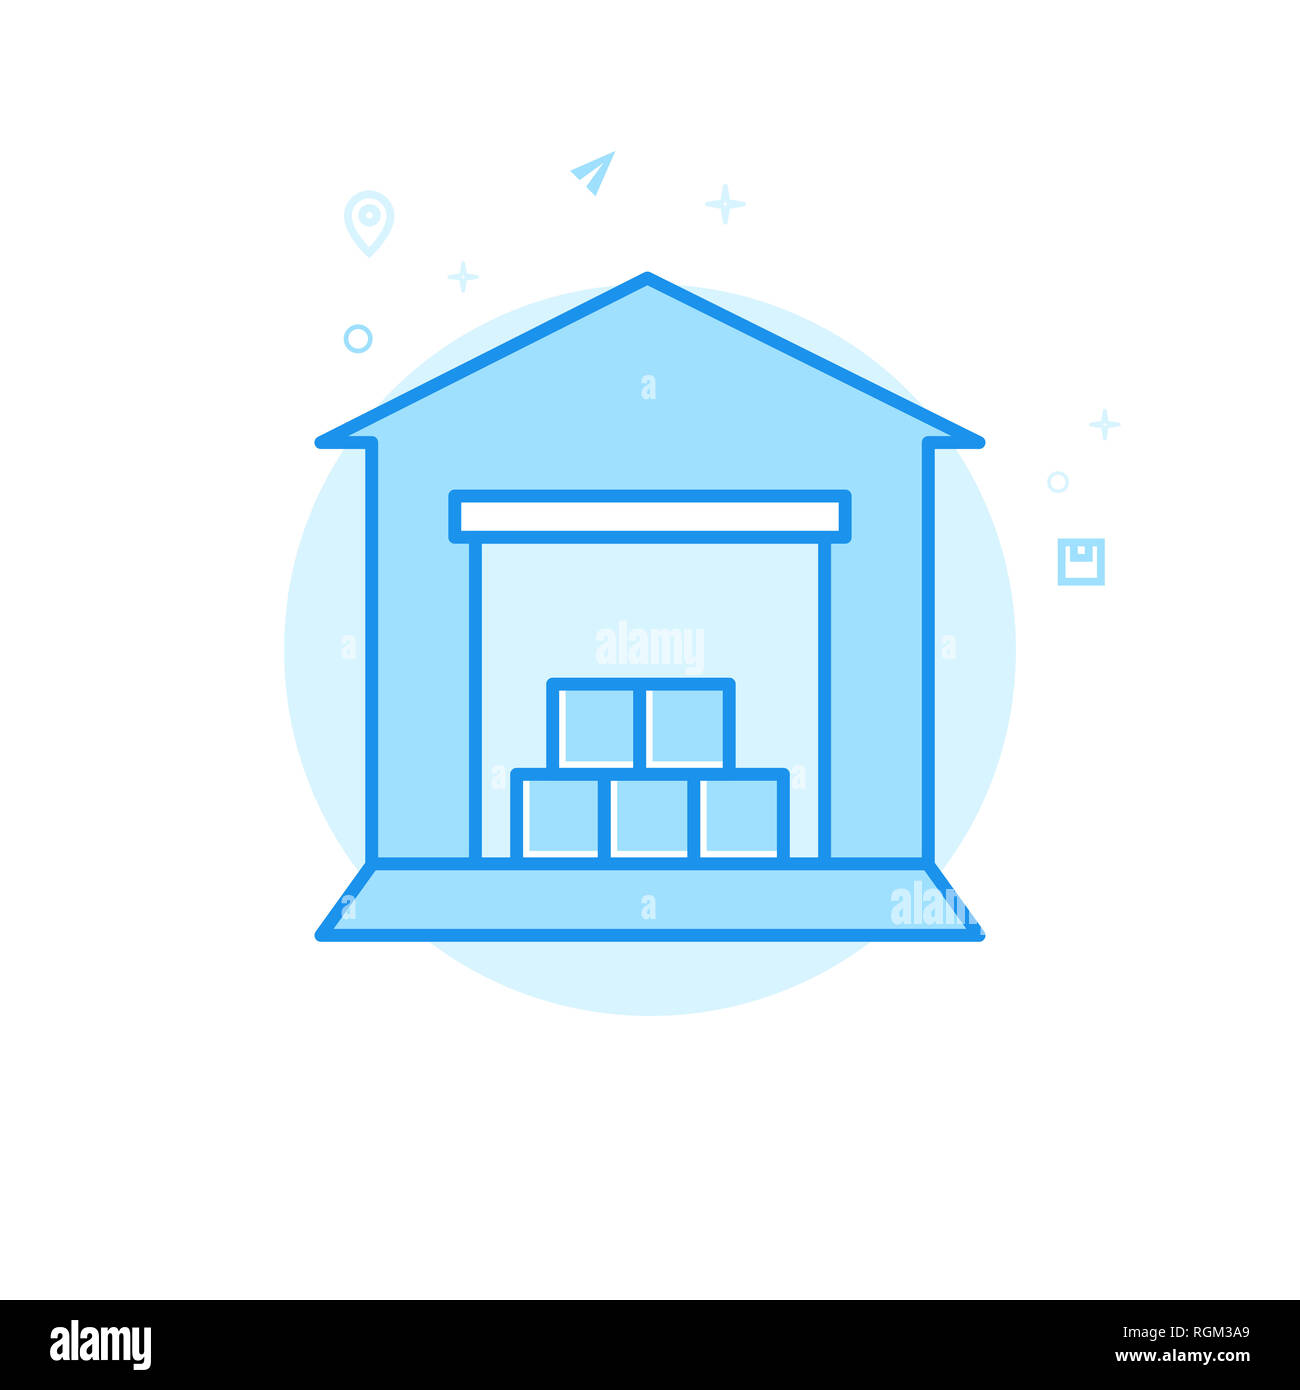 lager flachbild symbol lager und logistik symbol piktogramm sign licht flat style blue. Black Bedroom Furniture Sets. Home Design Ideas